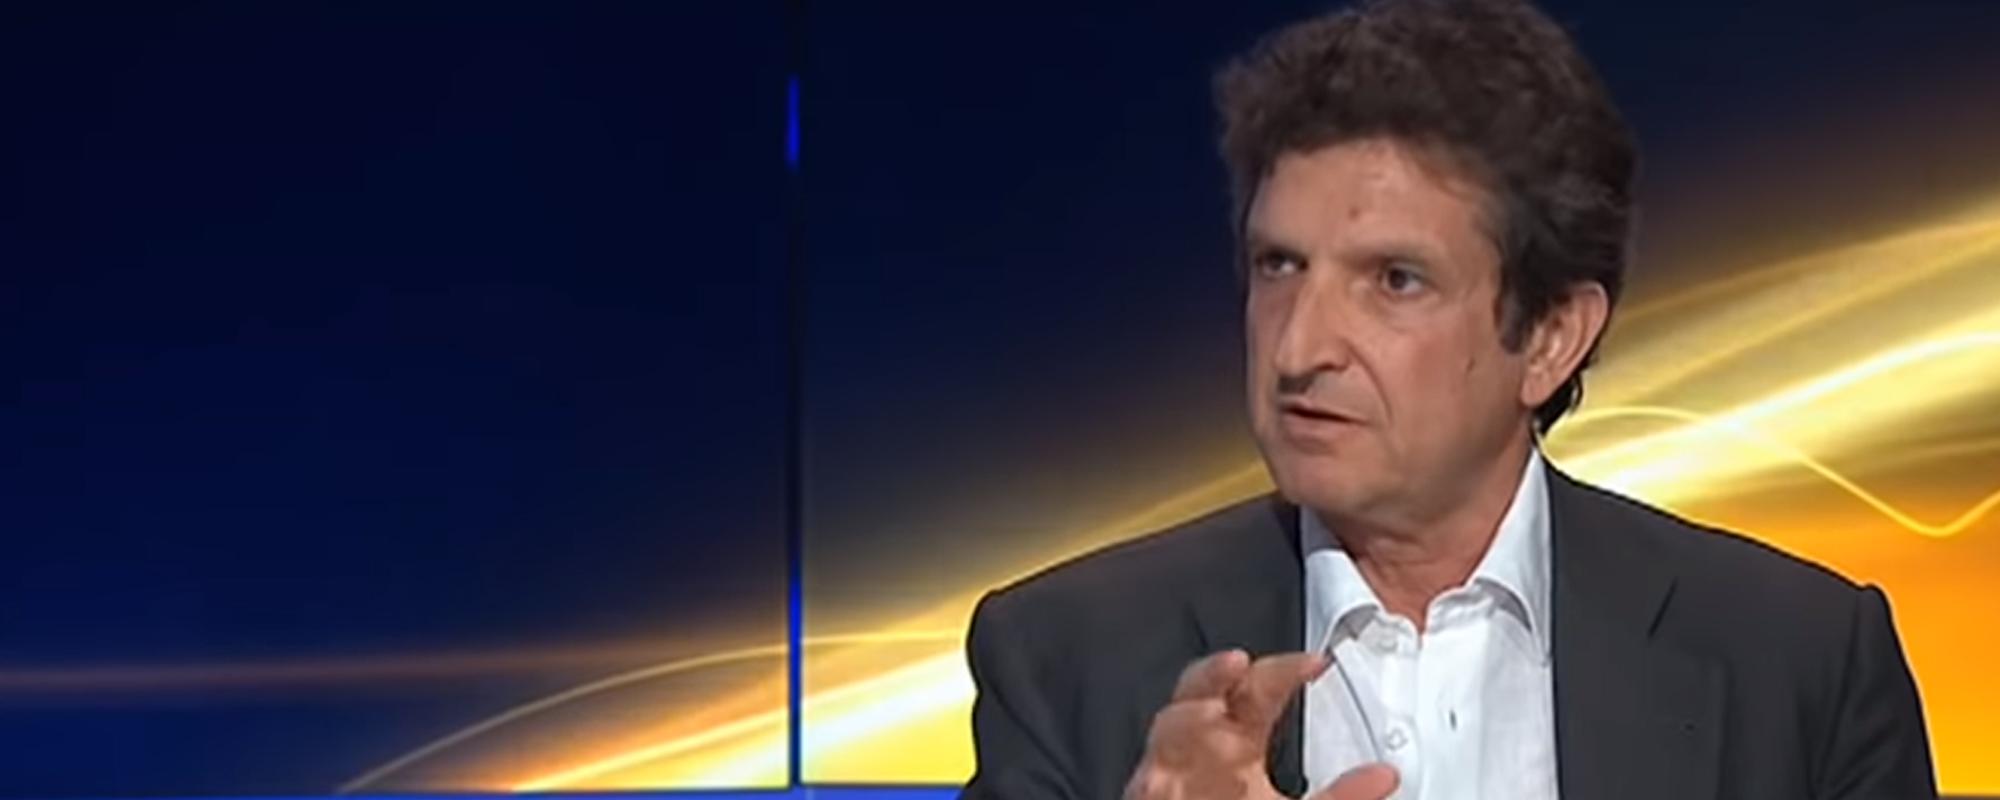 Giuseppe Scognamiglio at Aljazeera Mubasher Channel